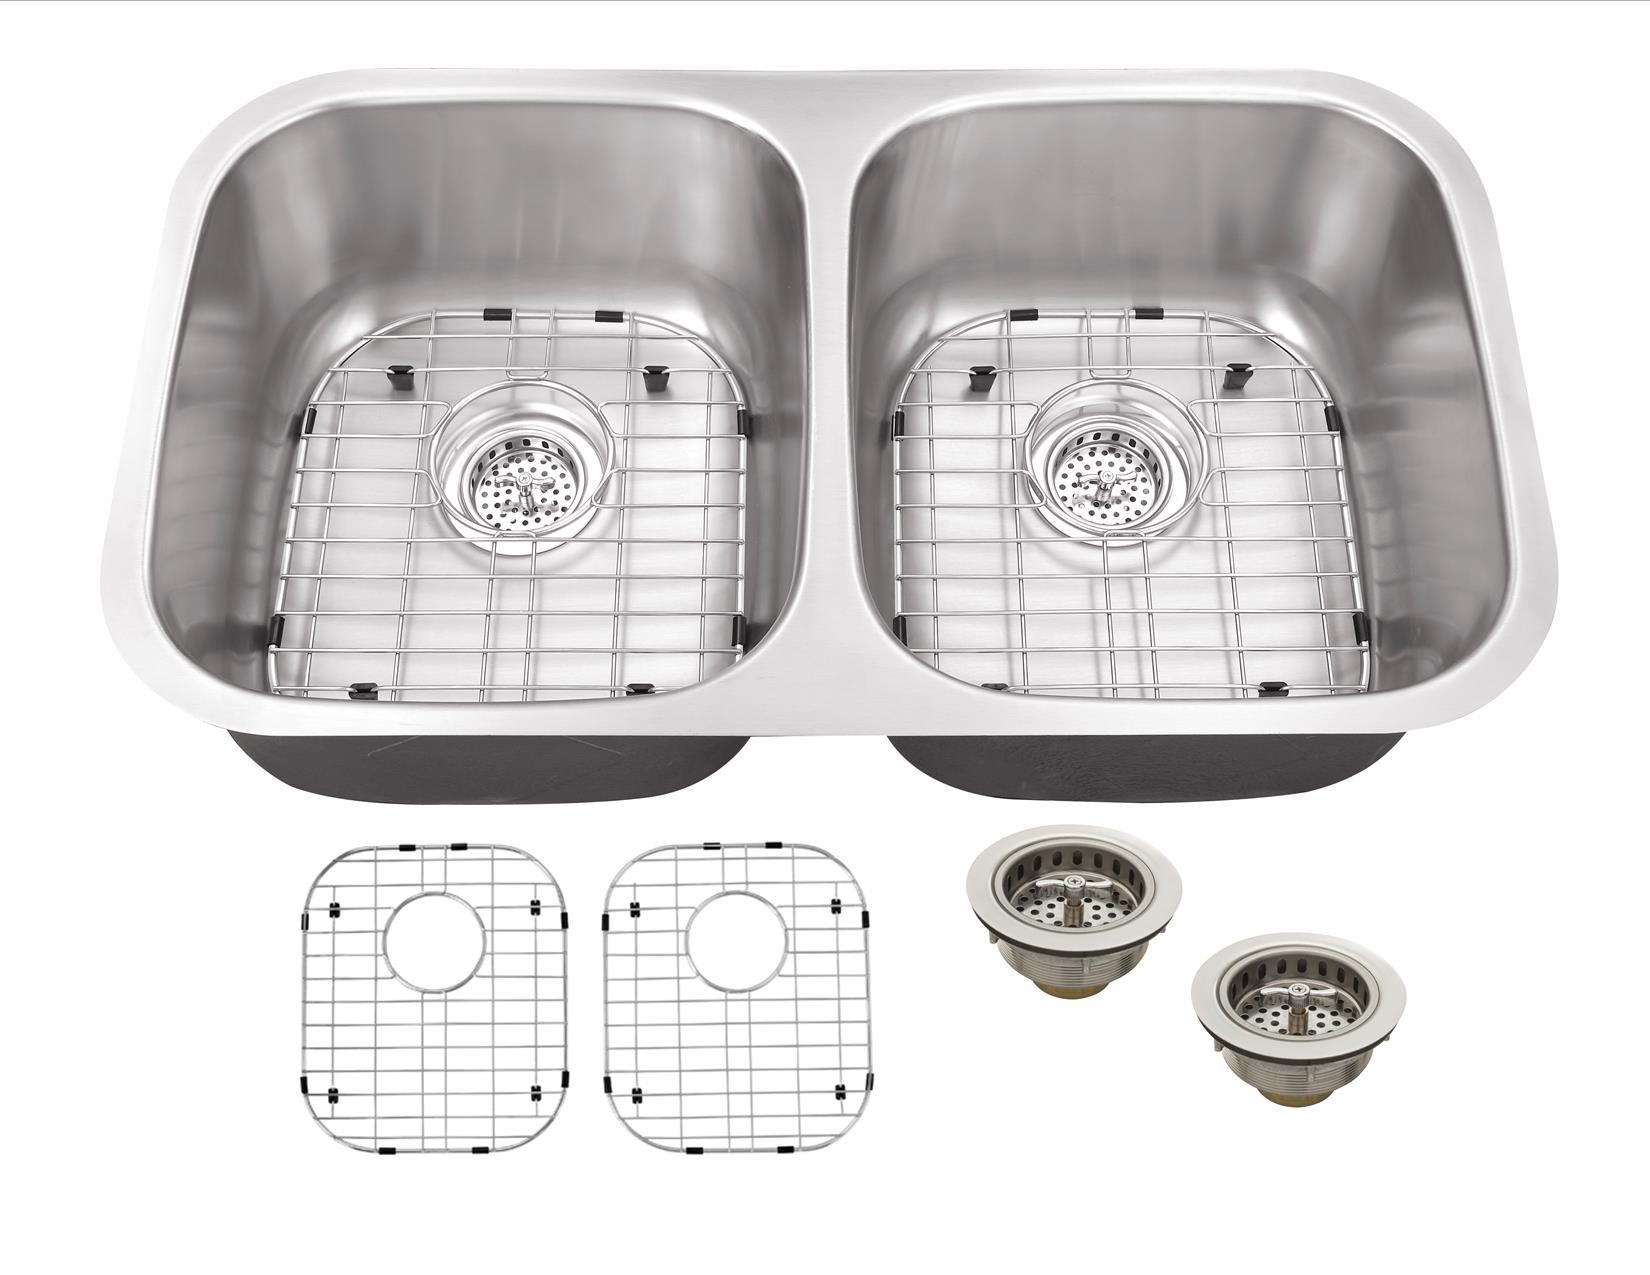 Cahaba CA121132 16 Gauge Double Kitchen Sink w/ Grid Set & Drain Assemblies